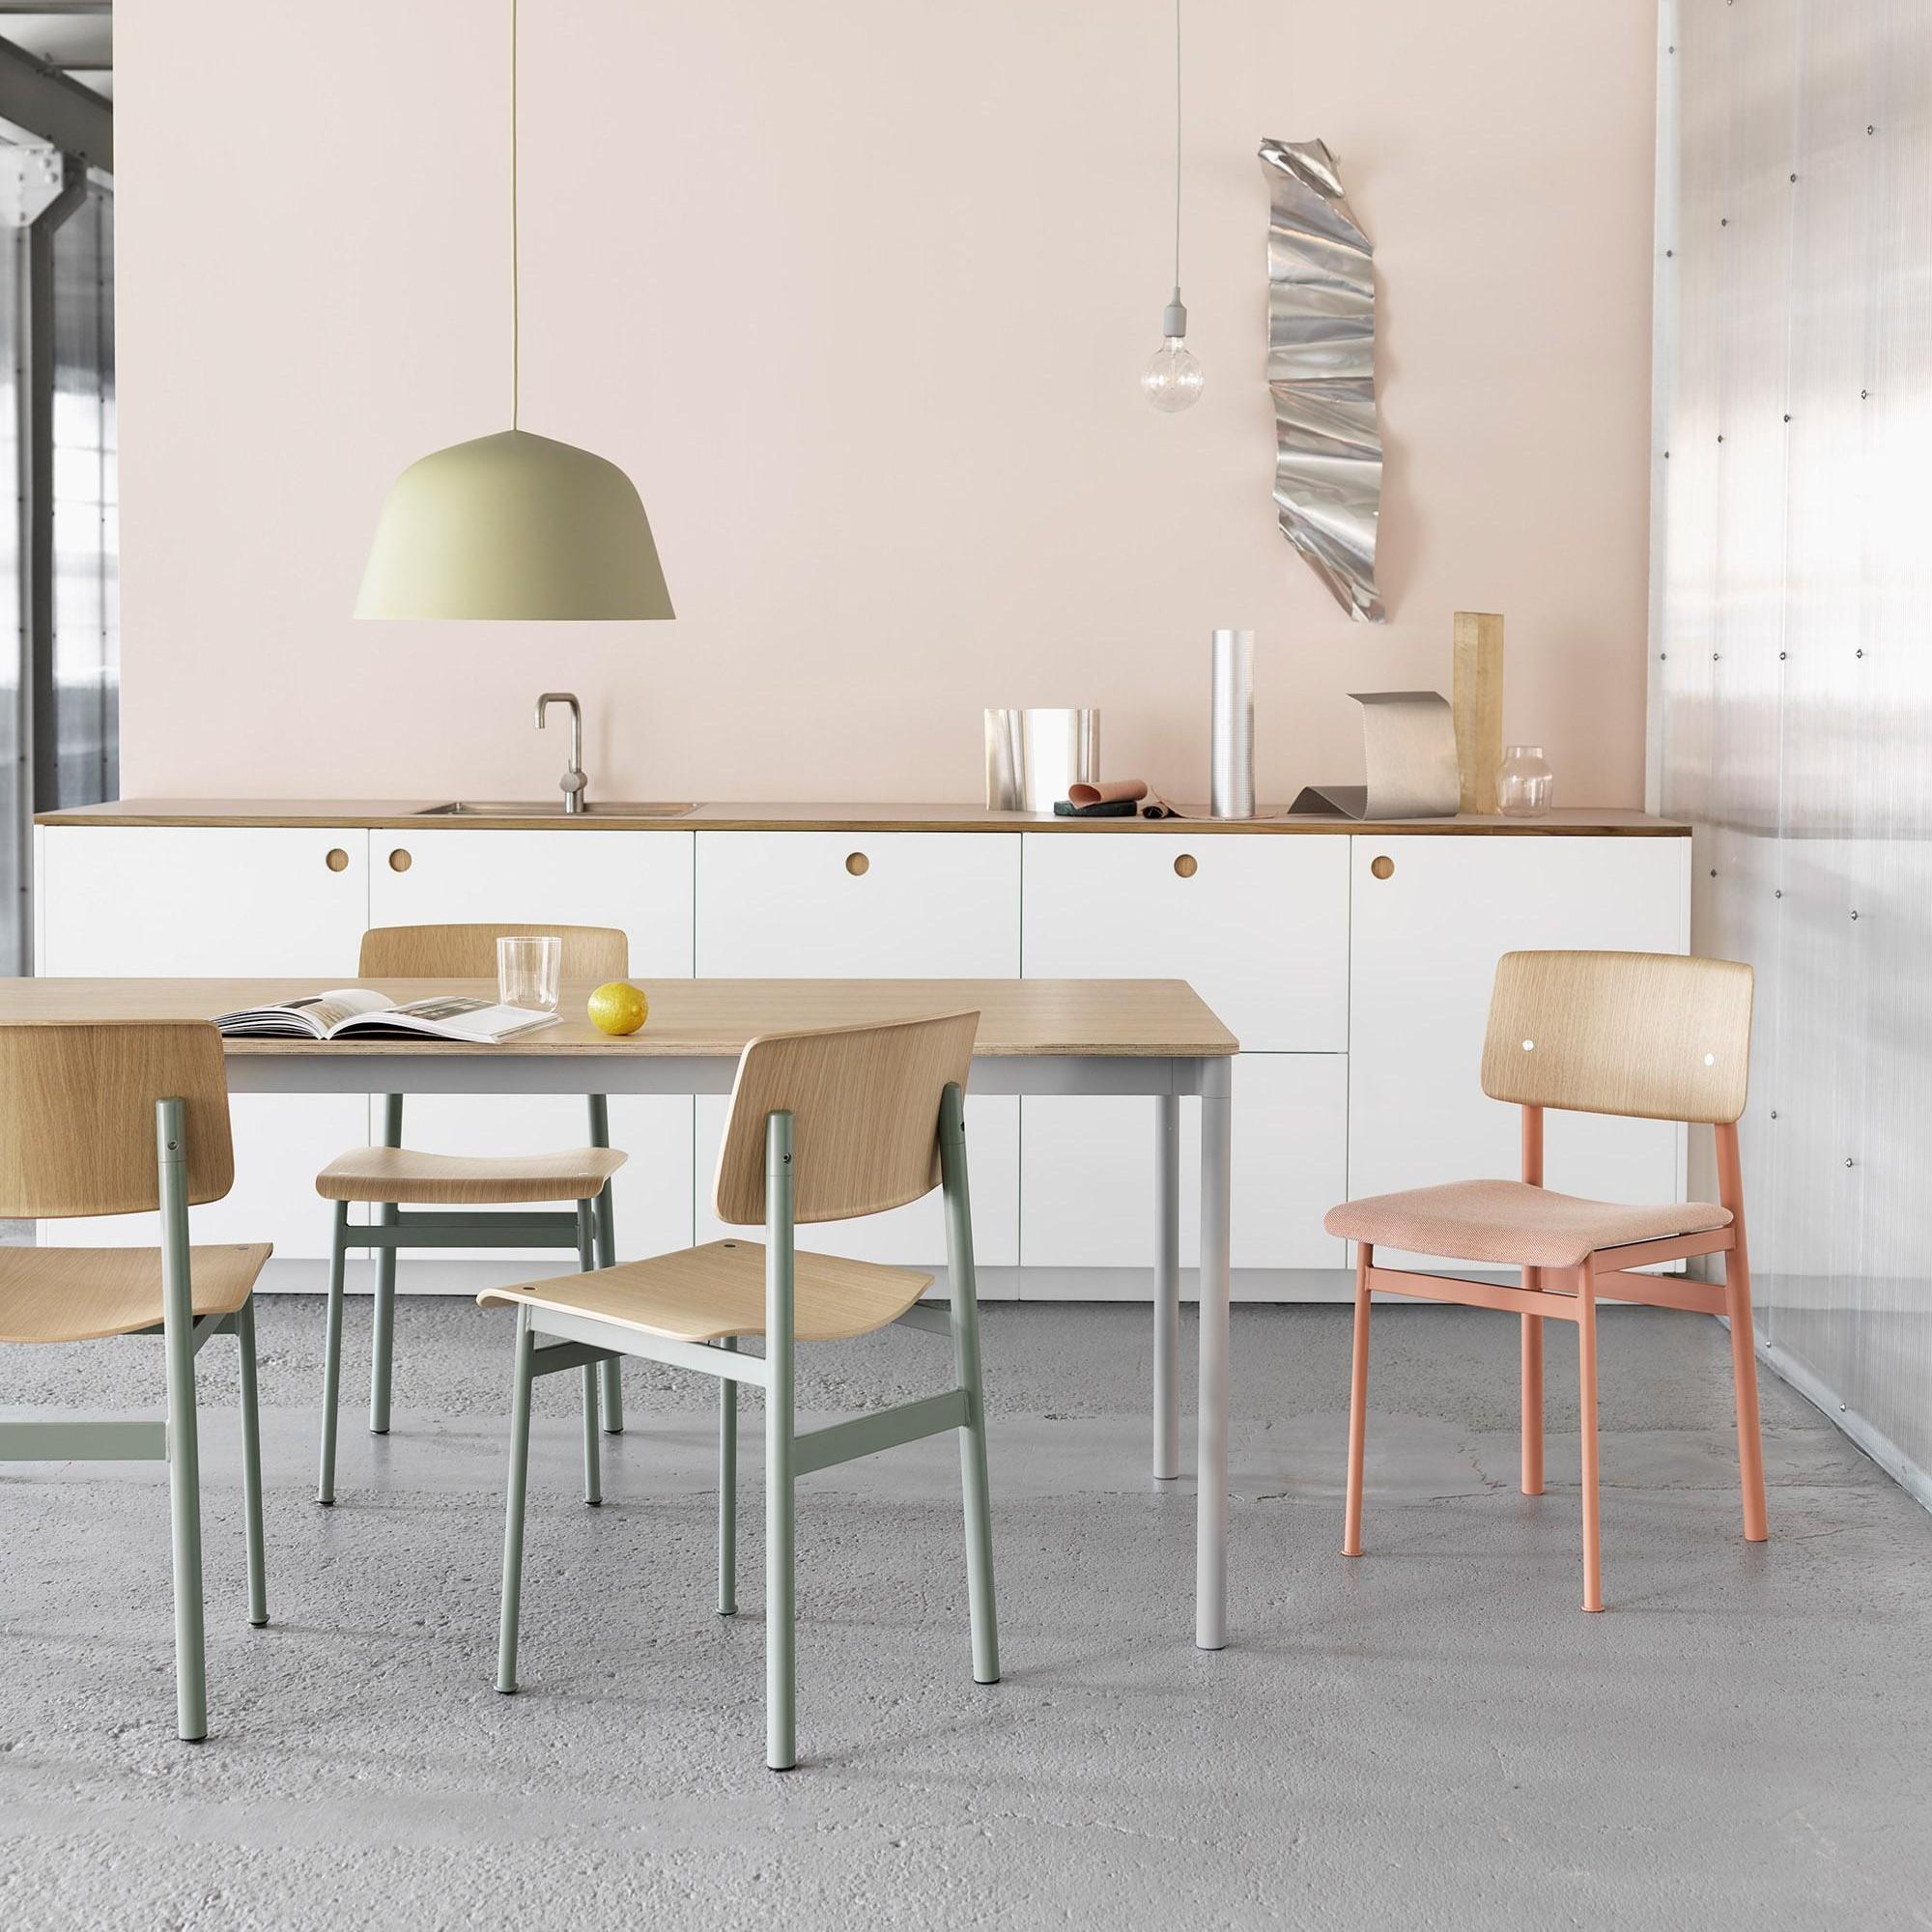 Muuto loft chair stuhl gepolstert ambientedirect for Stuhl gepolstert